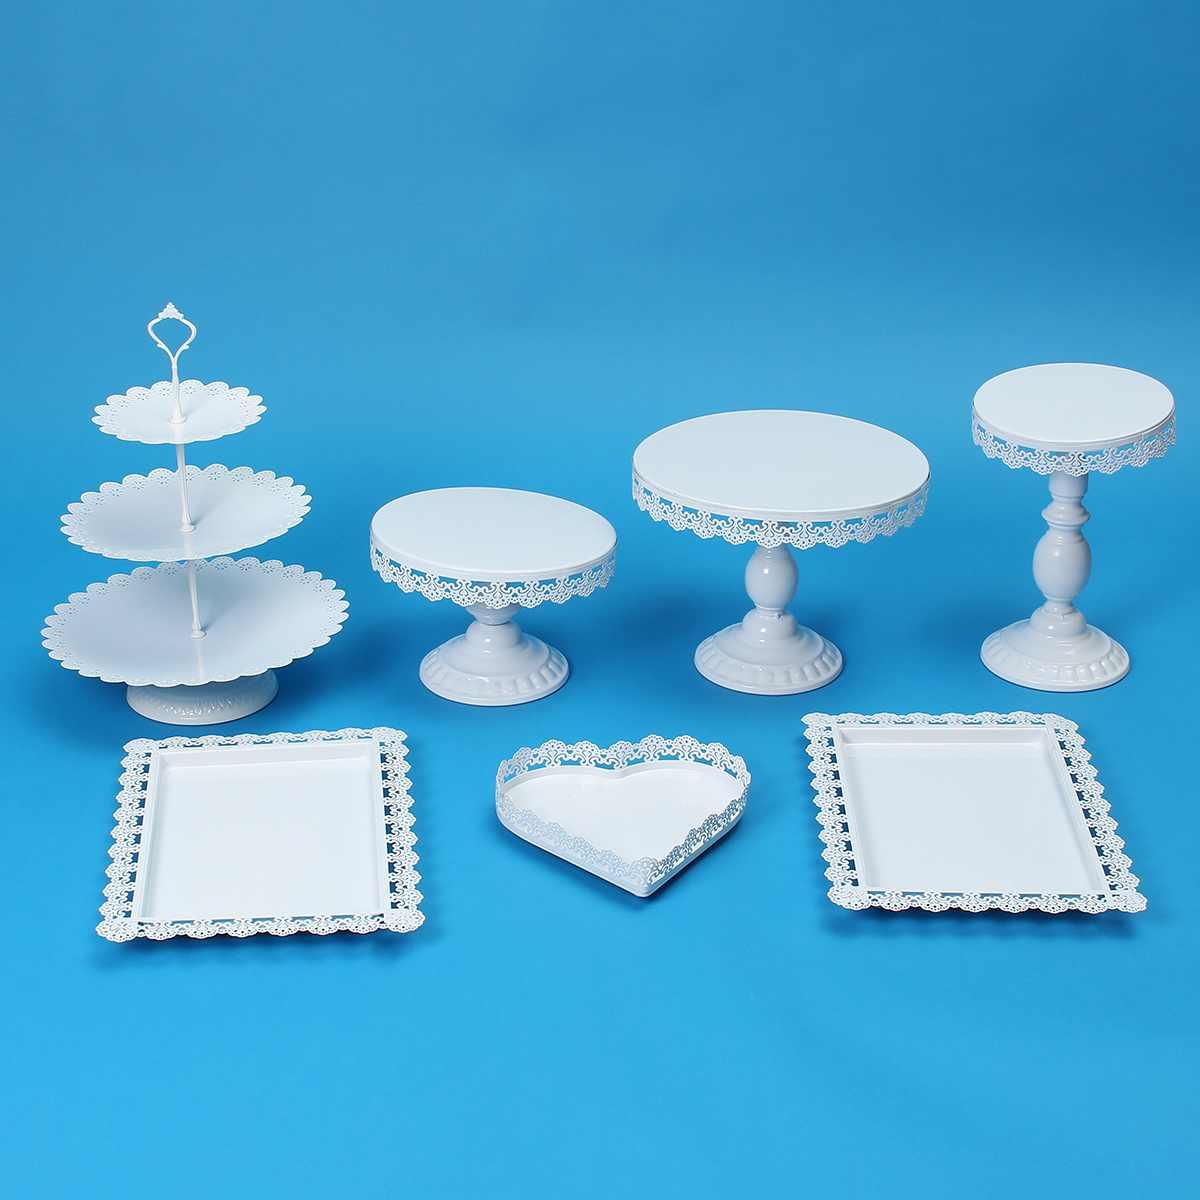 7 Piece Gold White Cake Stand Set Round Metal Crystal Cupcake Dessert Display Pedestal Wedding Party Display